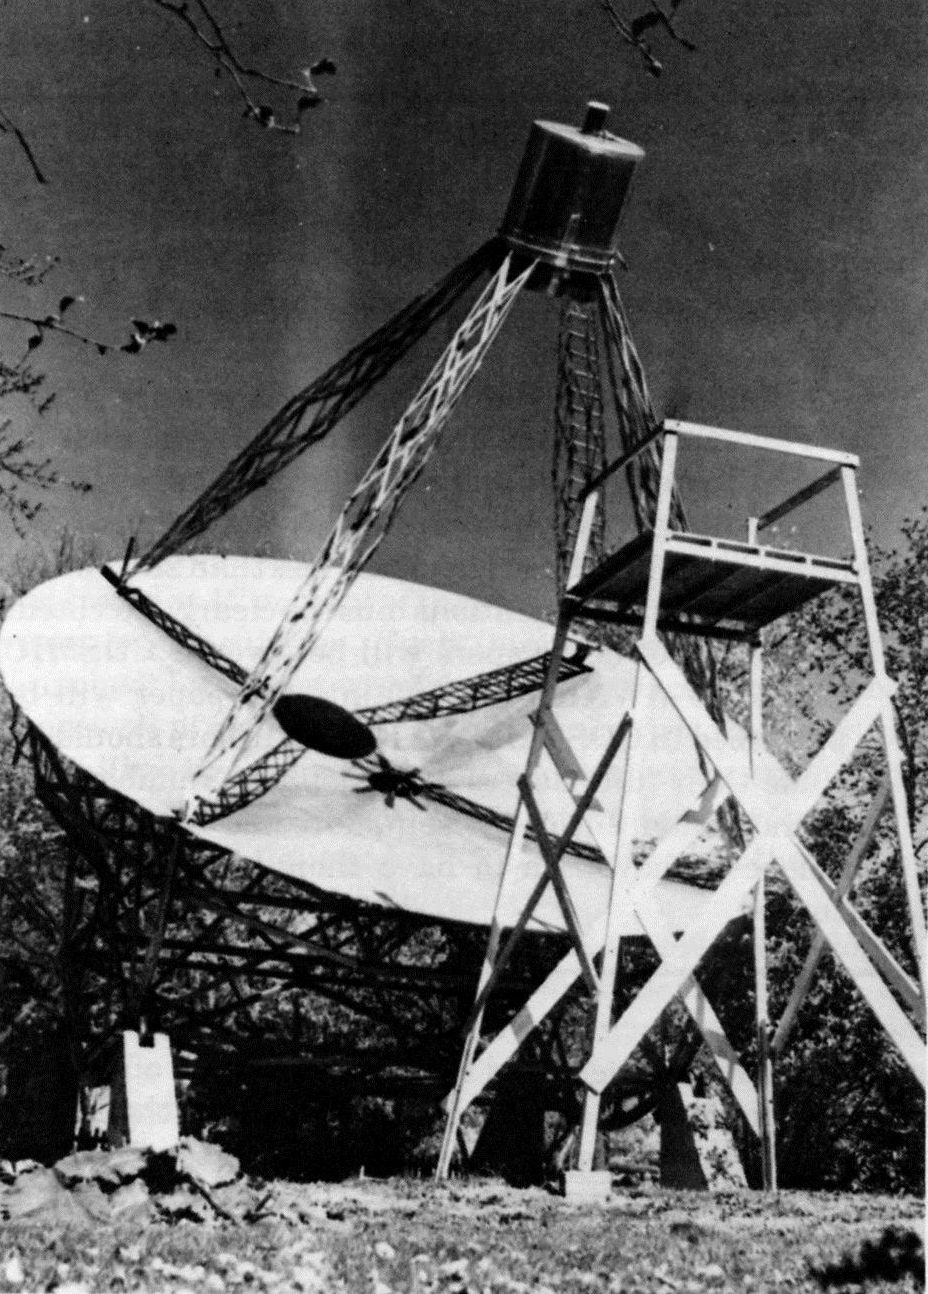 Antena de Grote Reber en Wheaton, Illinois. Primer radiotelescopio (Crédito: http://www.ezizka.net/astronomy/)